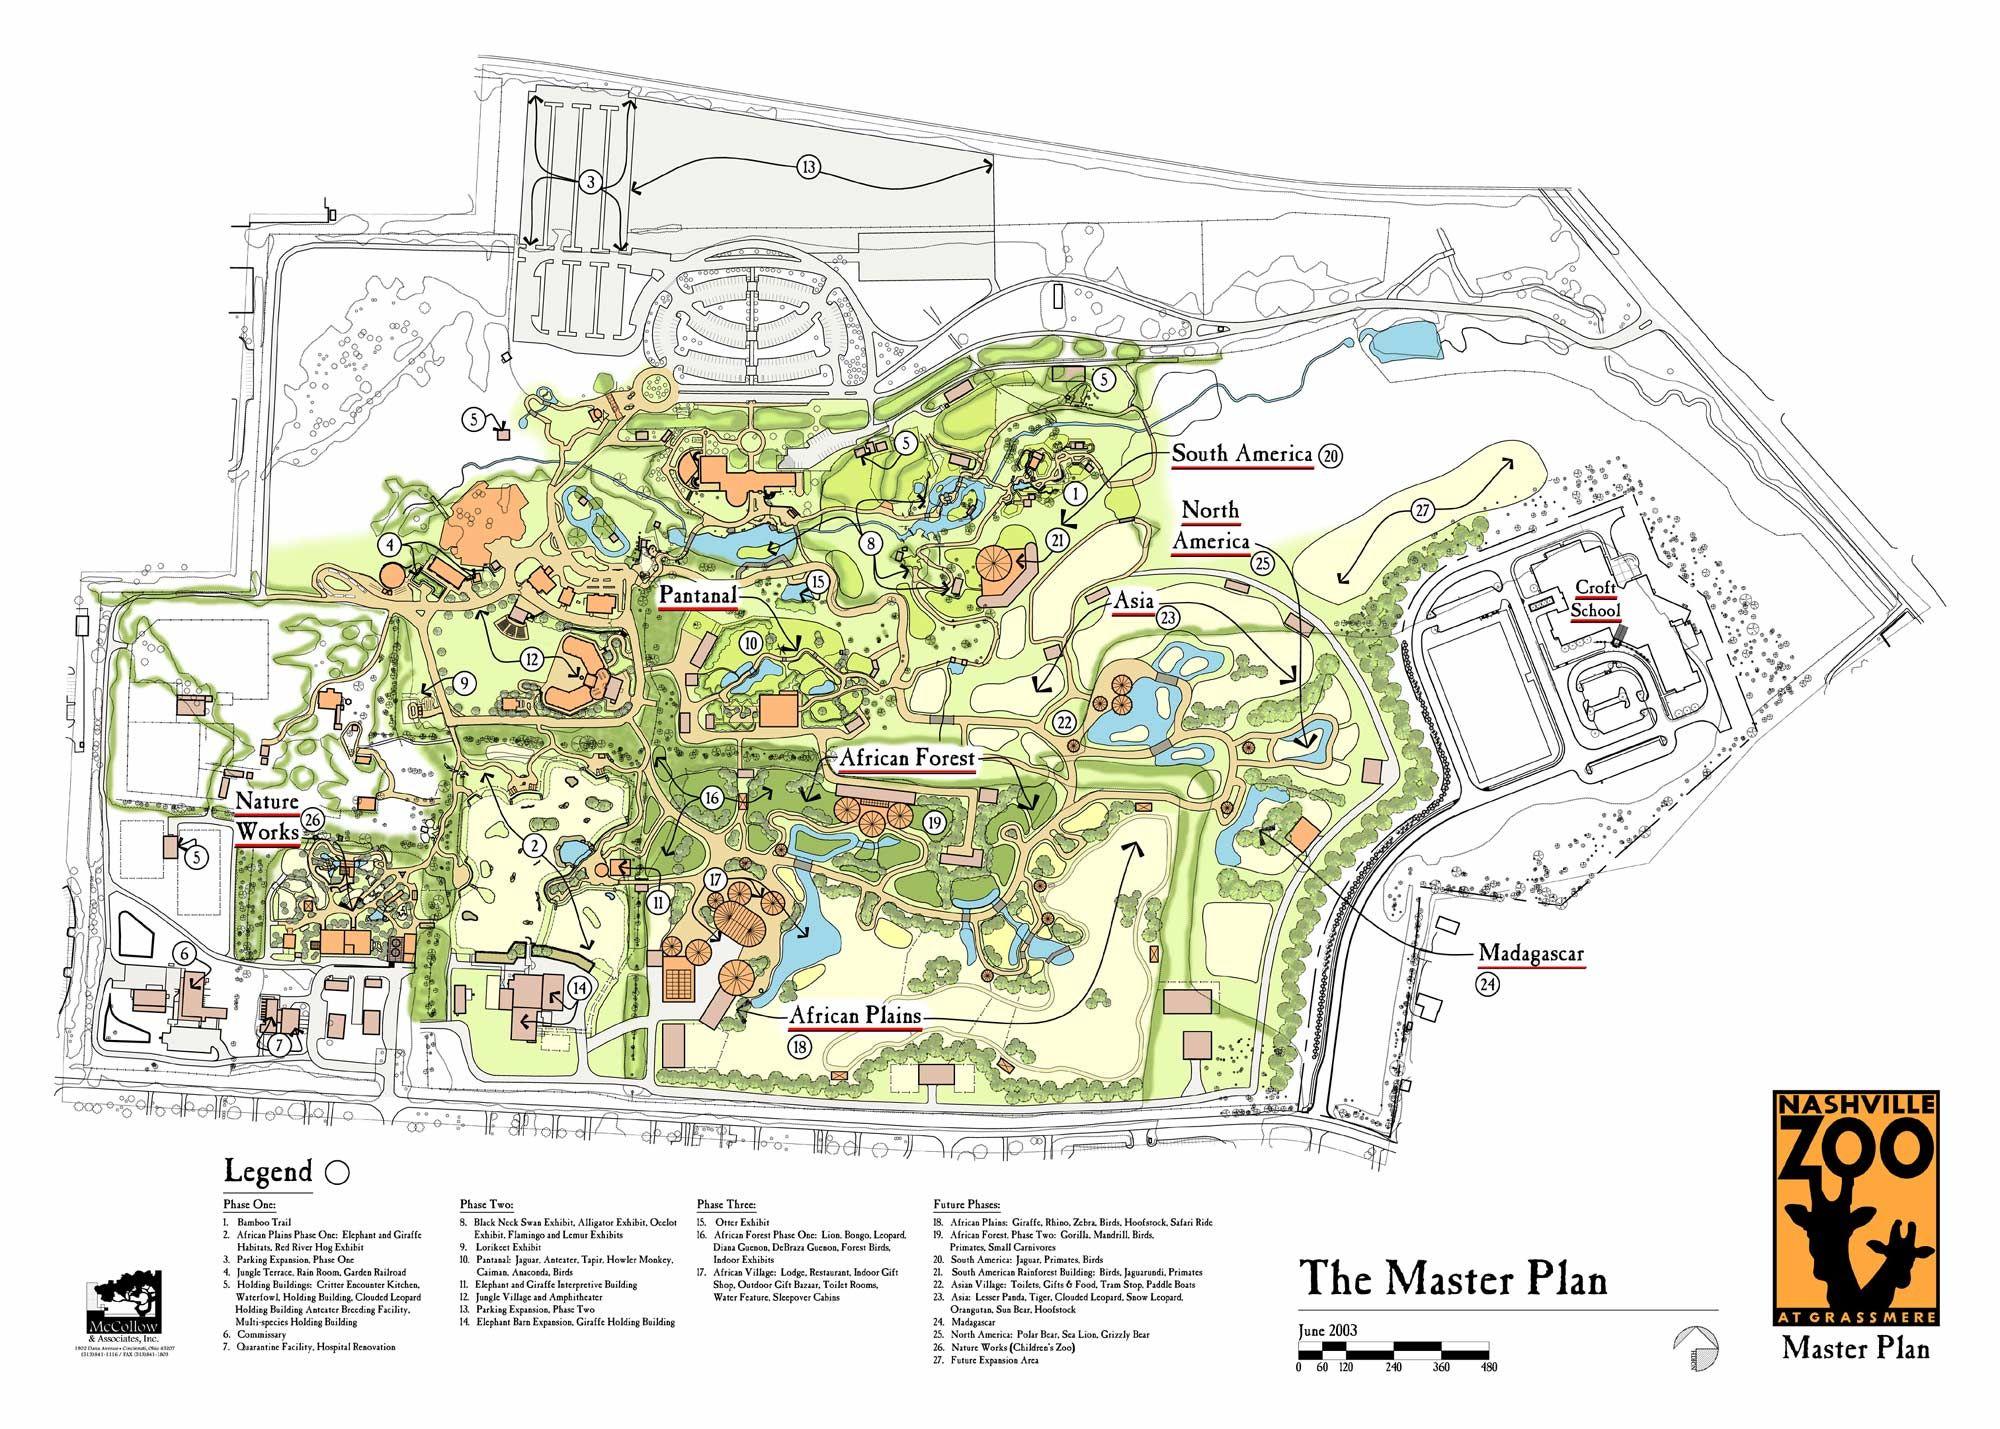 Nashville Zoo Map Tennessee Zoos Around the World Pinterest